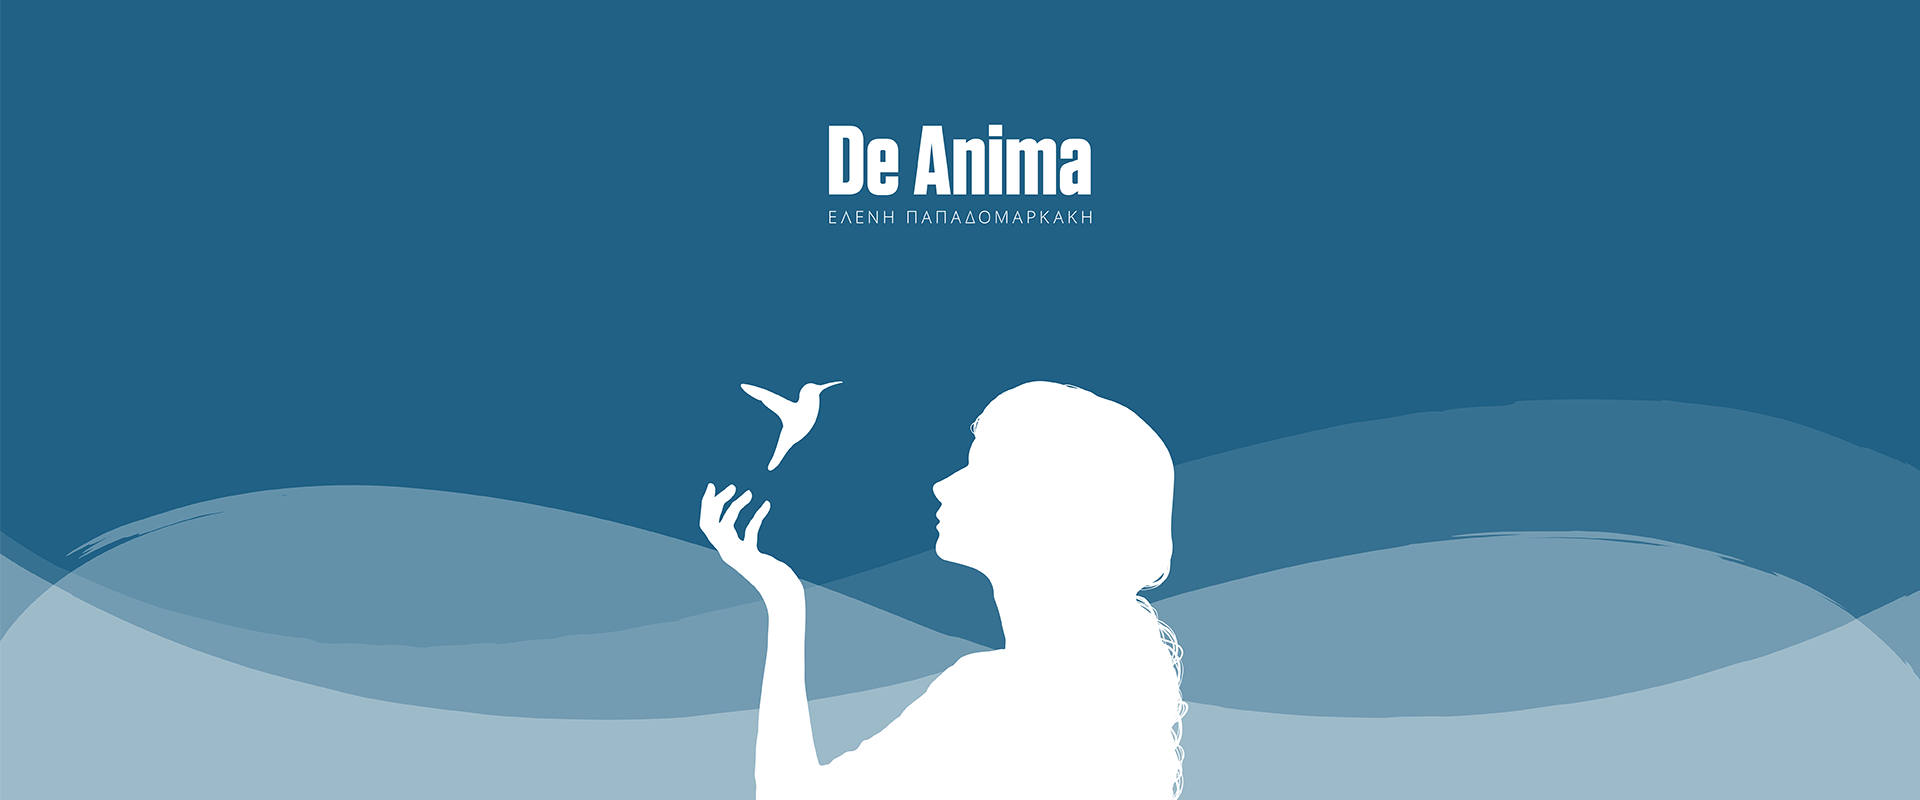 De Anima - Page Top Background Image - Girl & Humming Bird